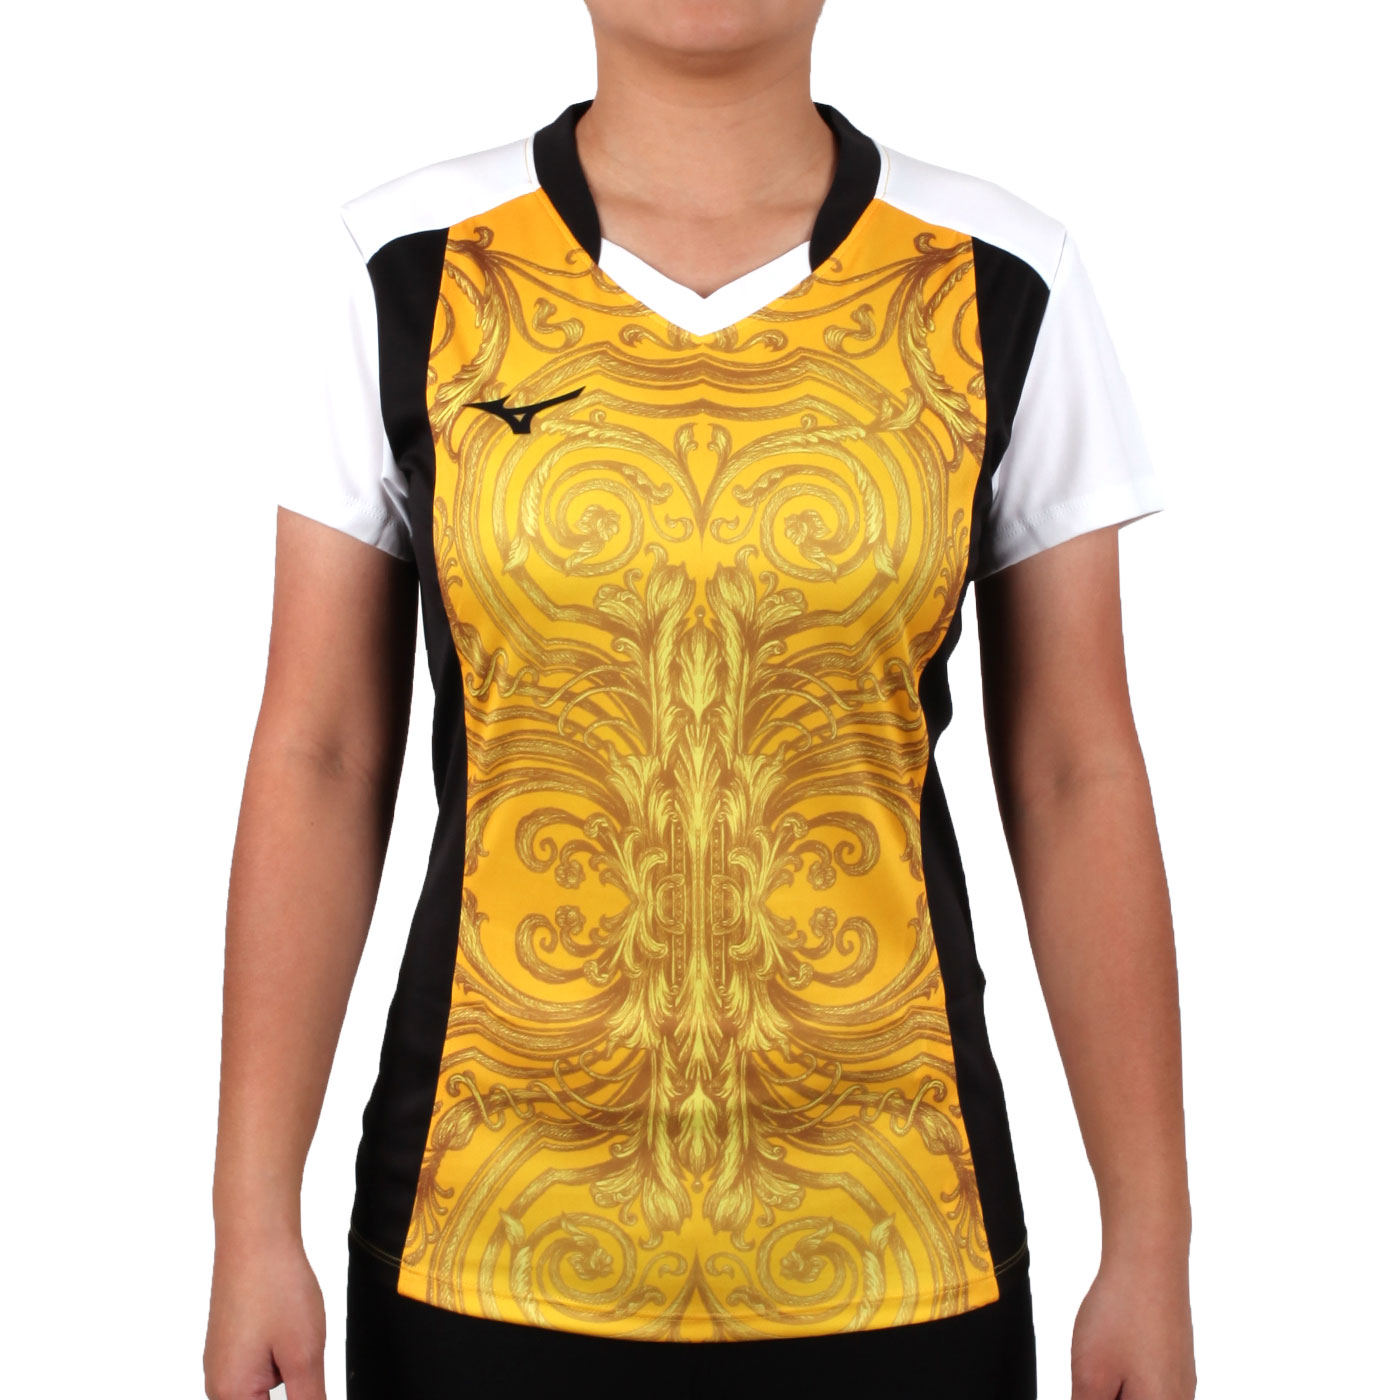 MIZUNO 女排球短袖上衣(2017企業排球聯賽) V2TA7C2843D - 黃黑